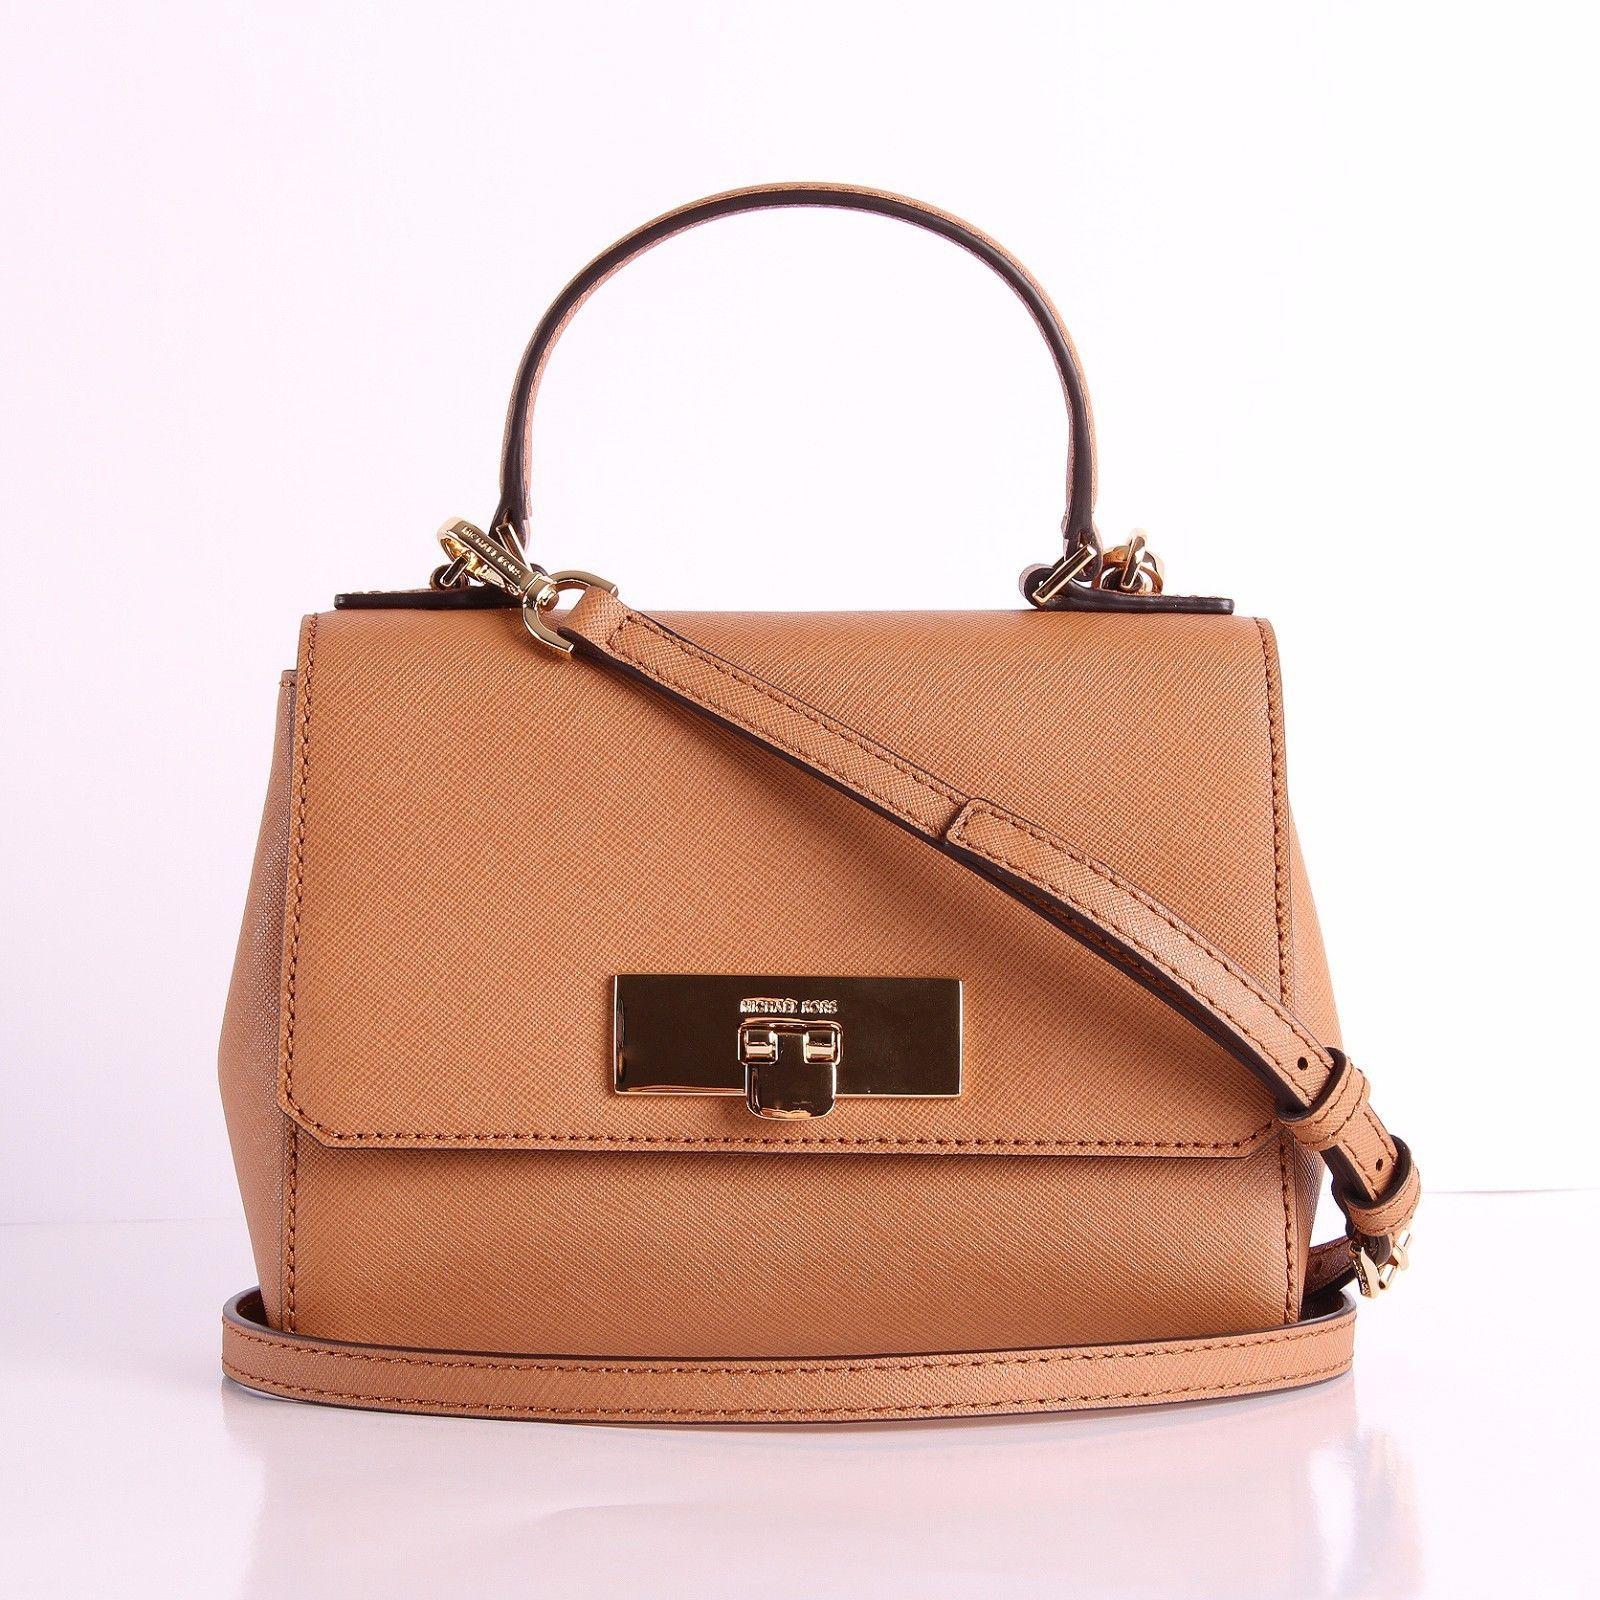 a75dc17af09d NWT Michael Kors CALLIE Leather/PVC XS Crossbody Bag Satchel Handbag $127.0